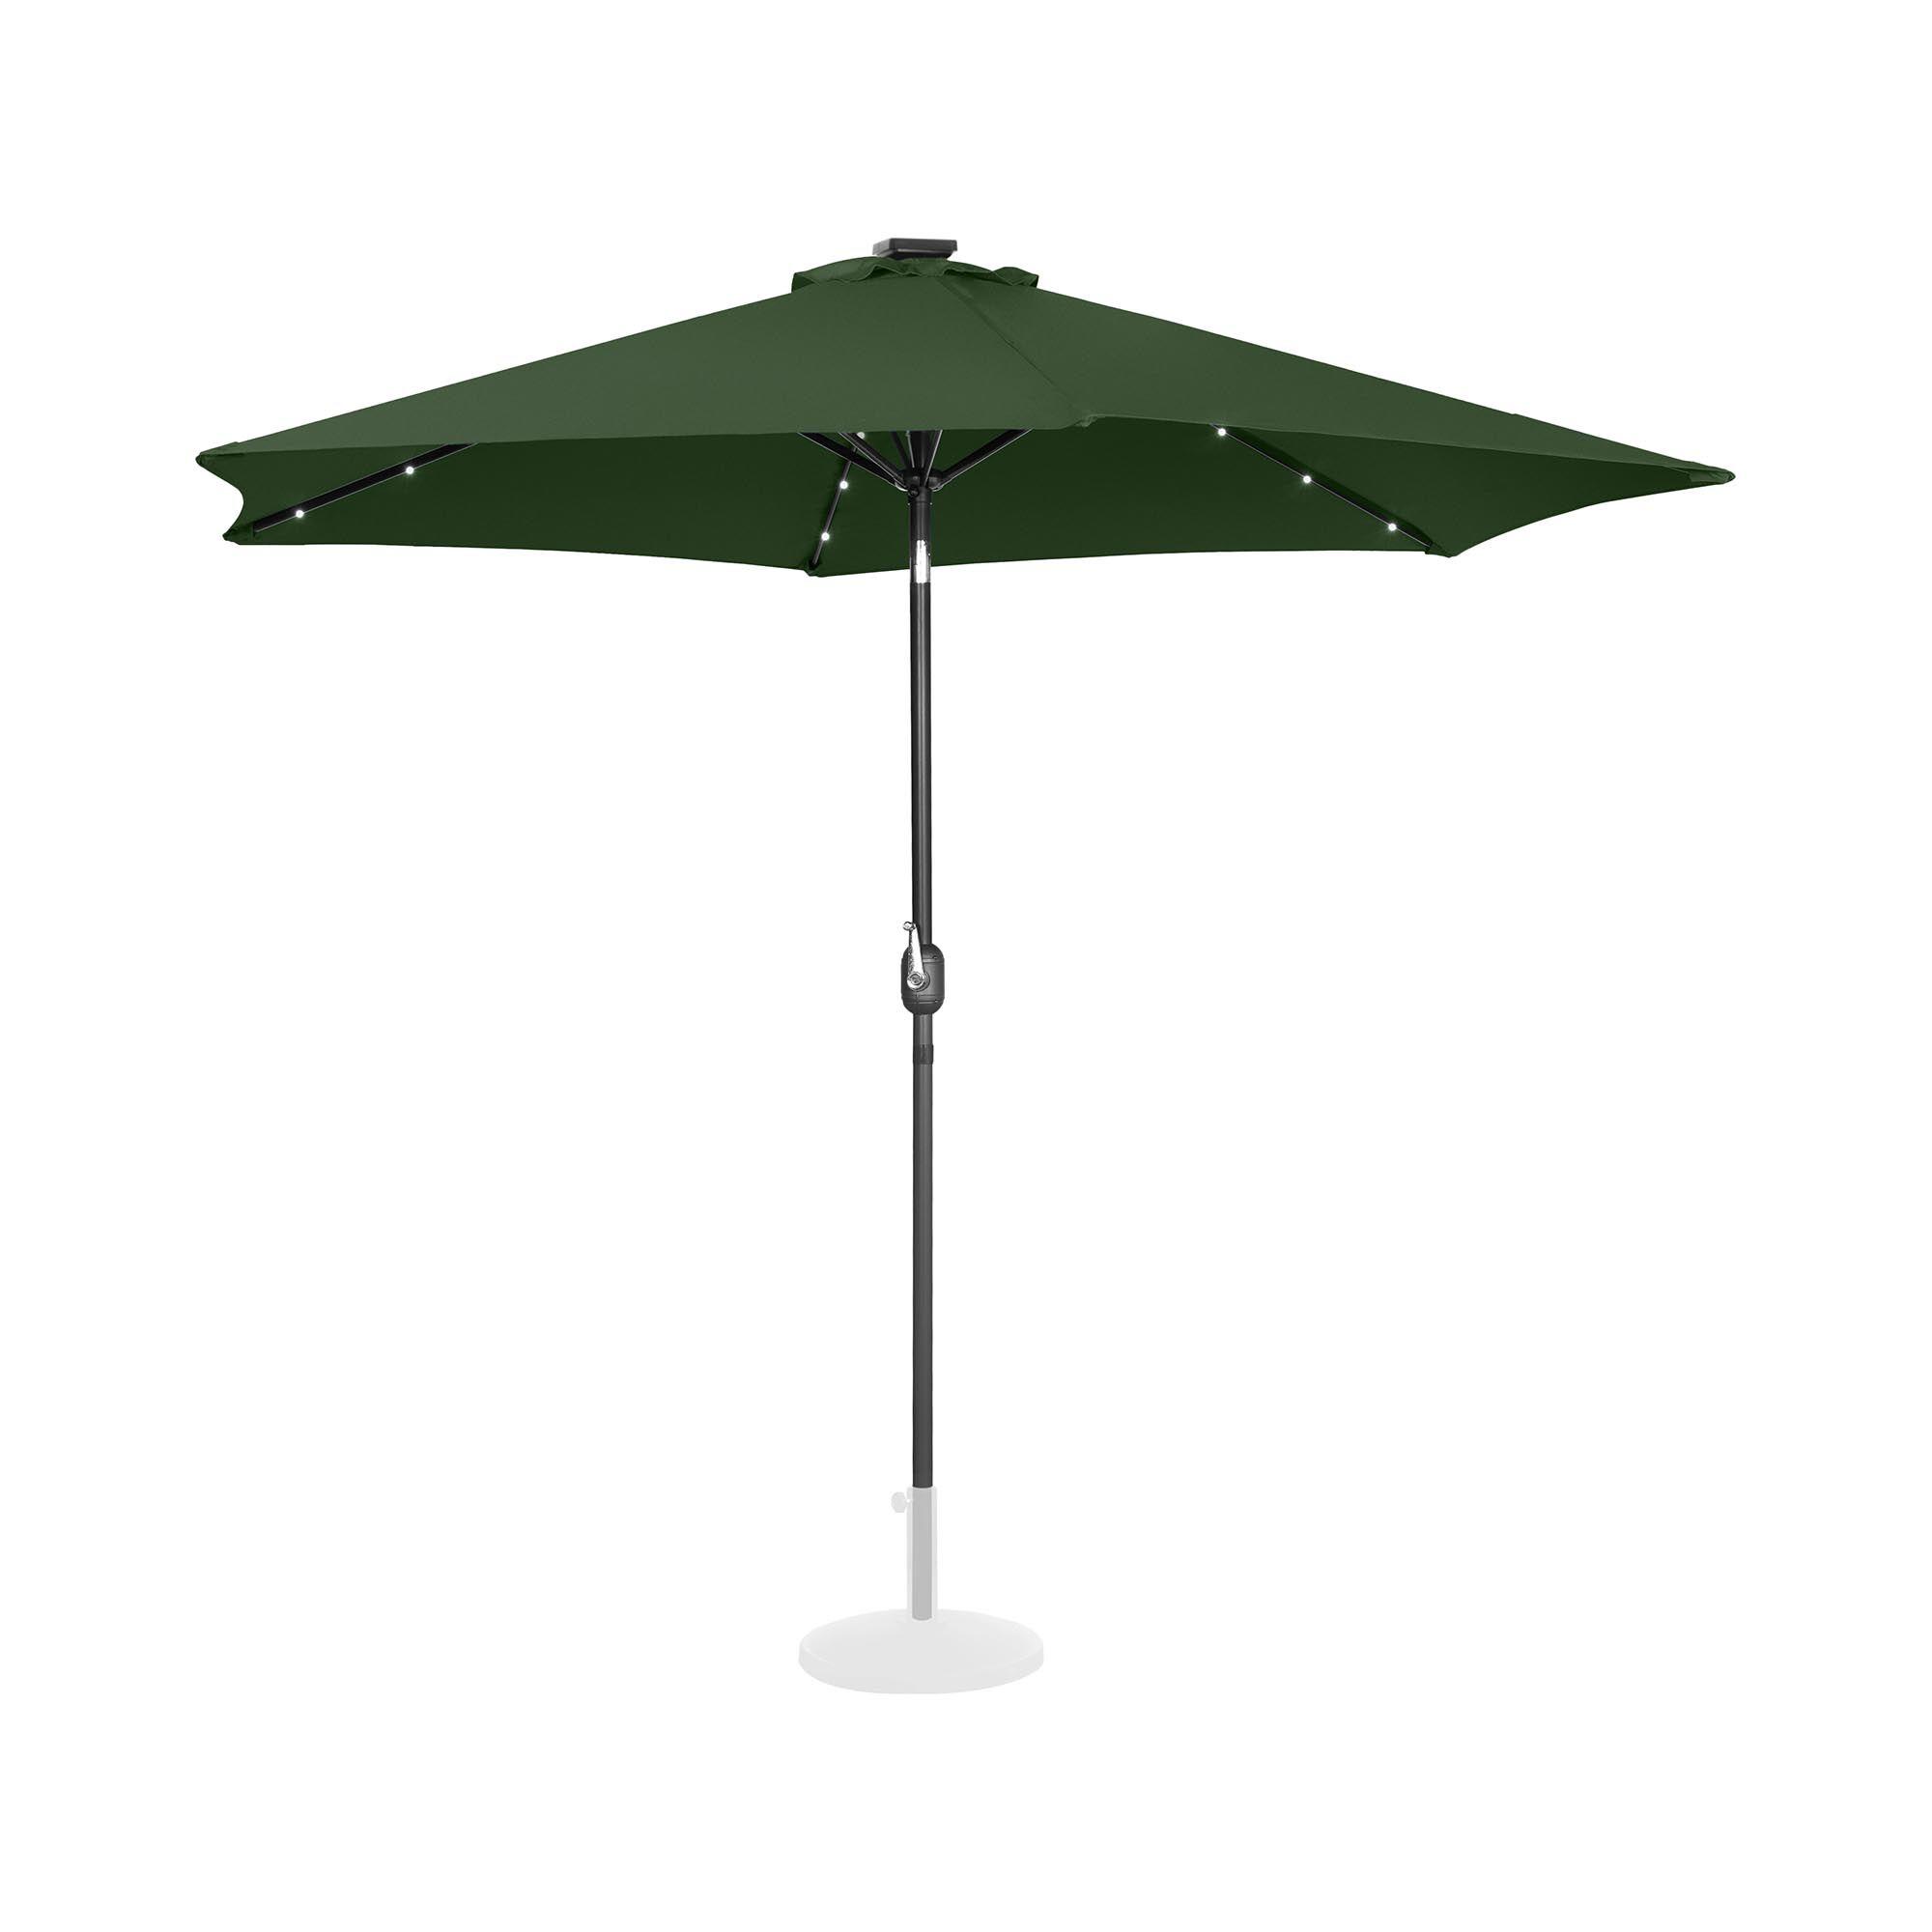 Uniprodo Parasoll med LED - grønn - rund - Ø 300 cm - kan skråstilles